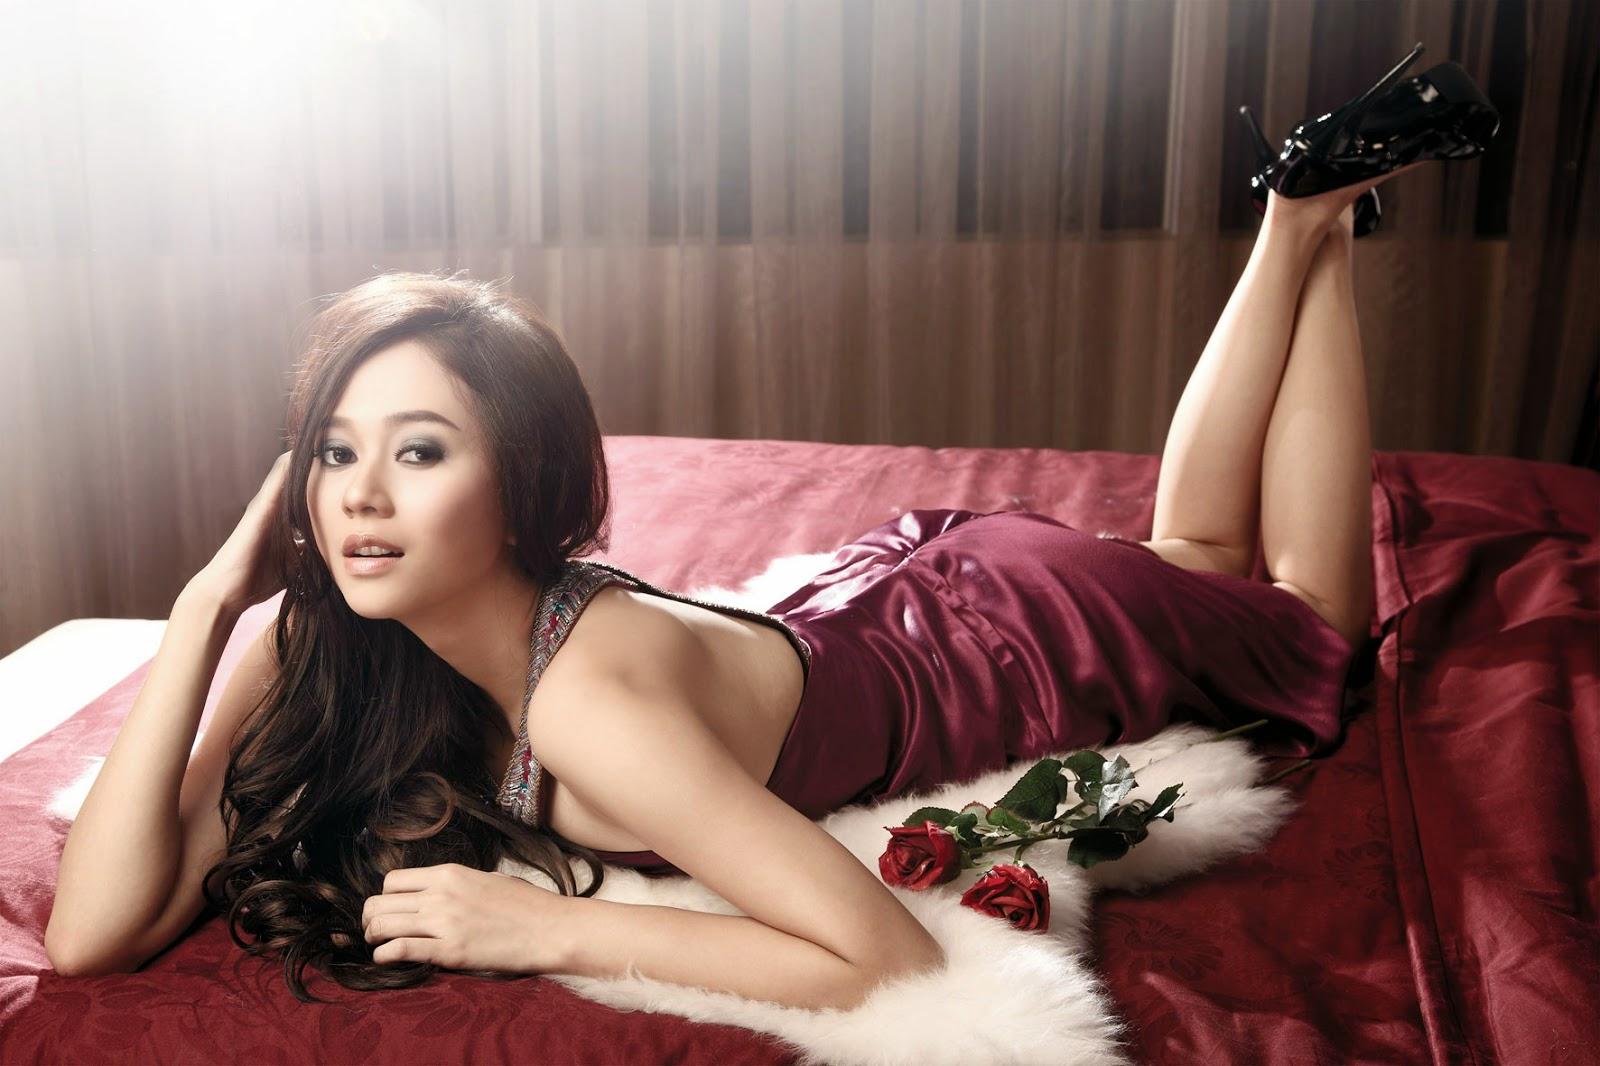 Foto wow sek hot sexy clips